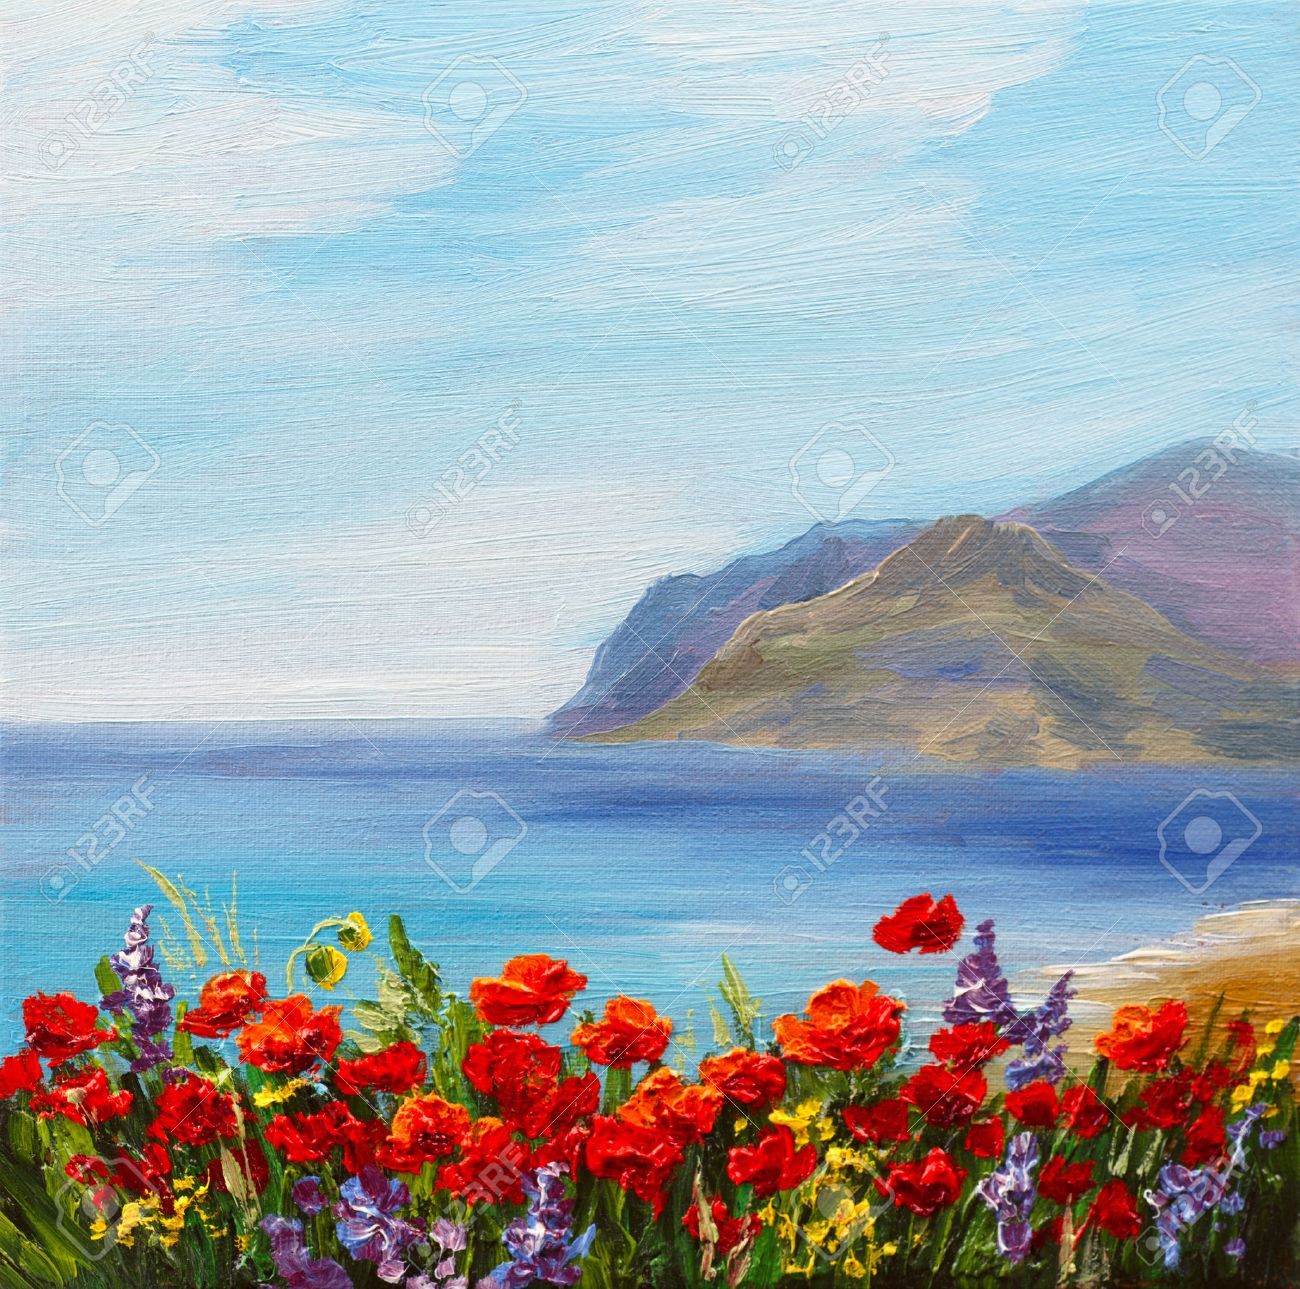 poppy field near the sea, colorful coast, art oil painting - 59803737